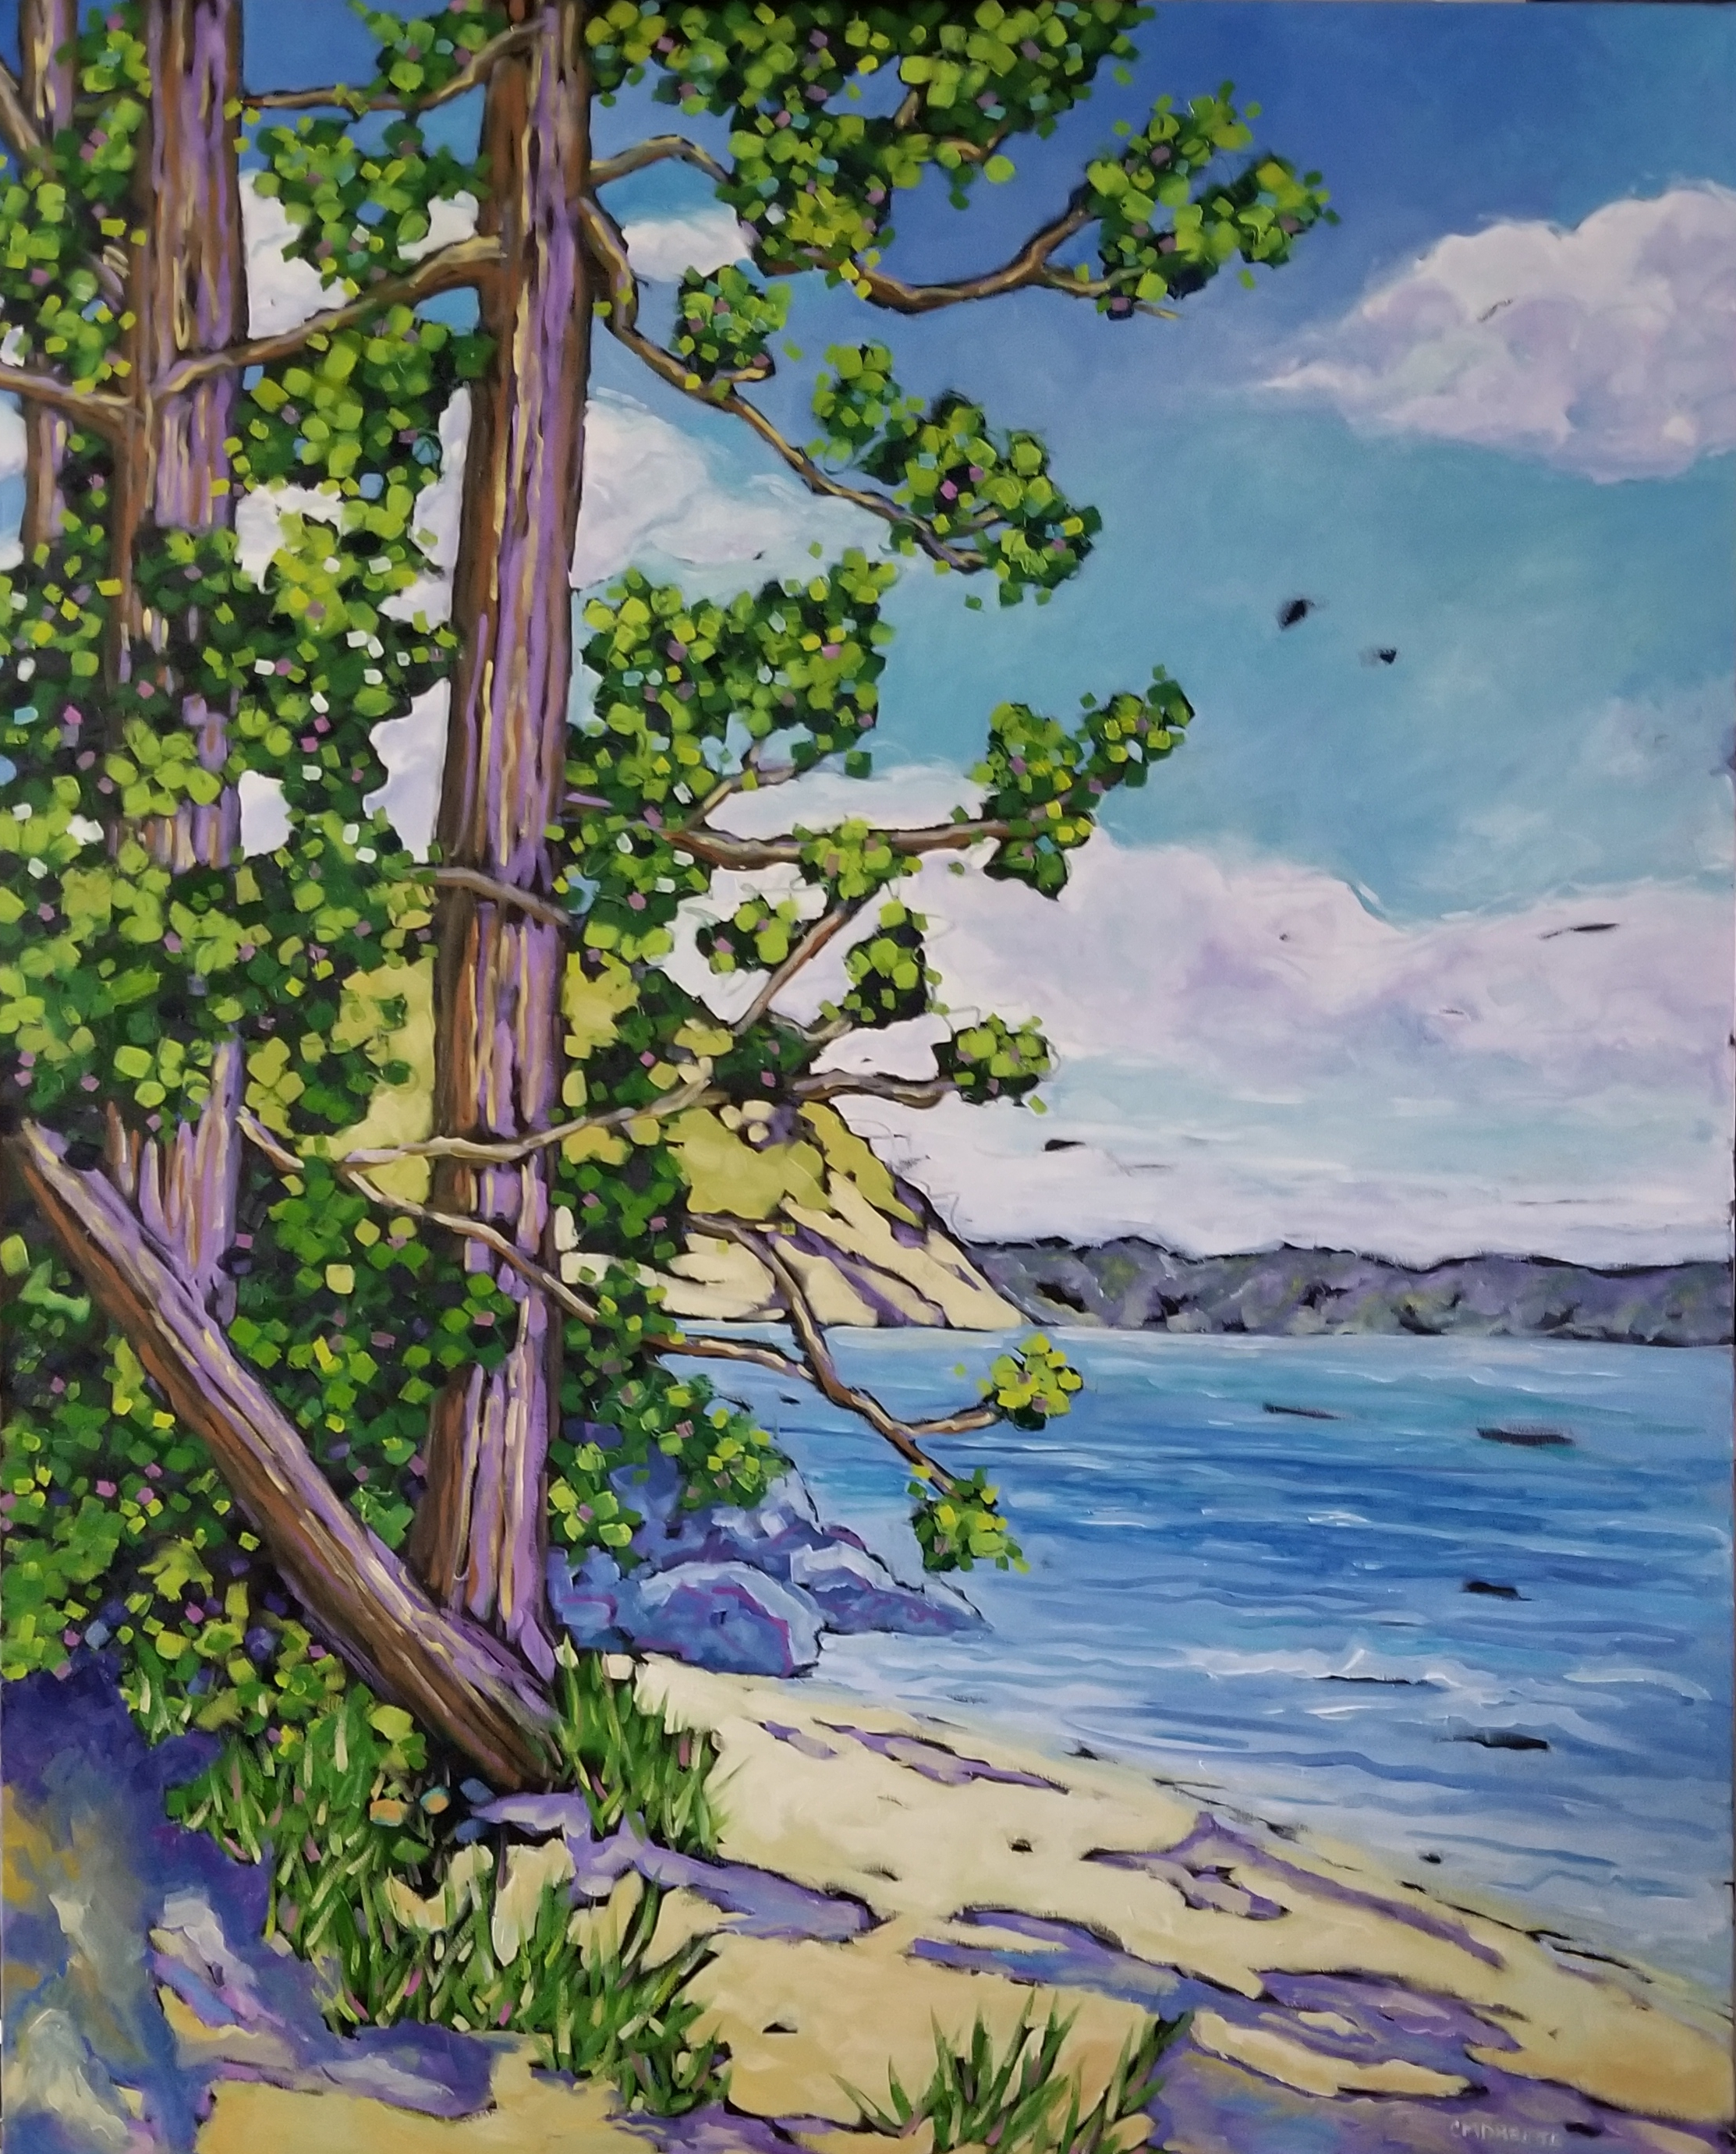 christi dreese Long Walks on the Beach oil painting 47x58